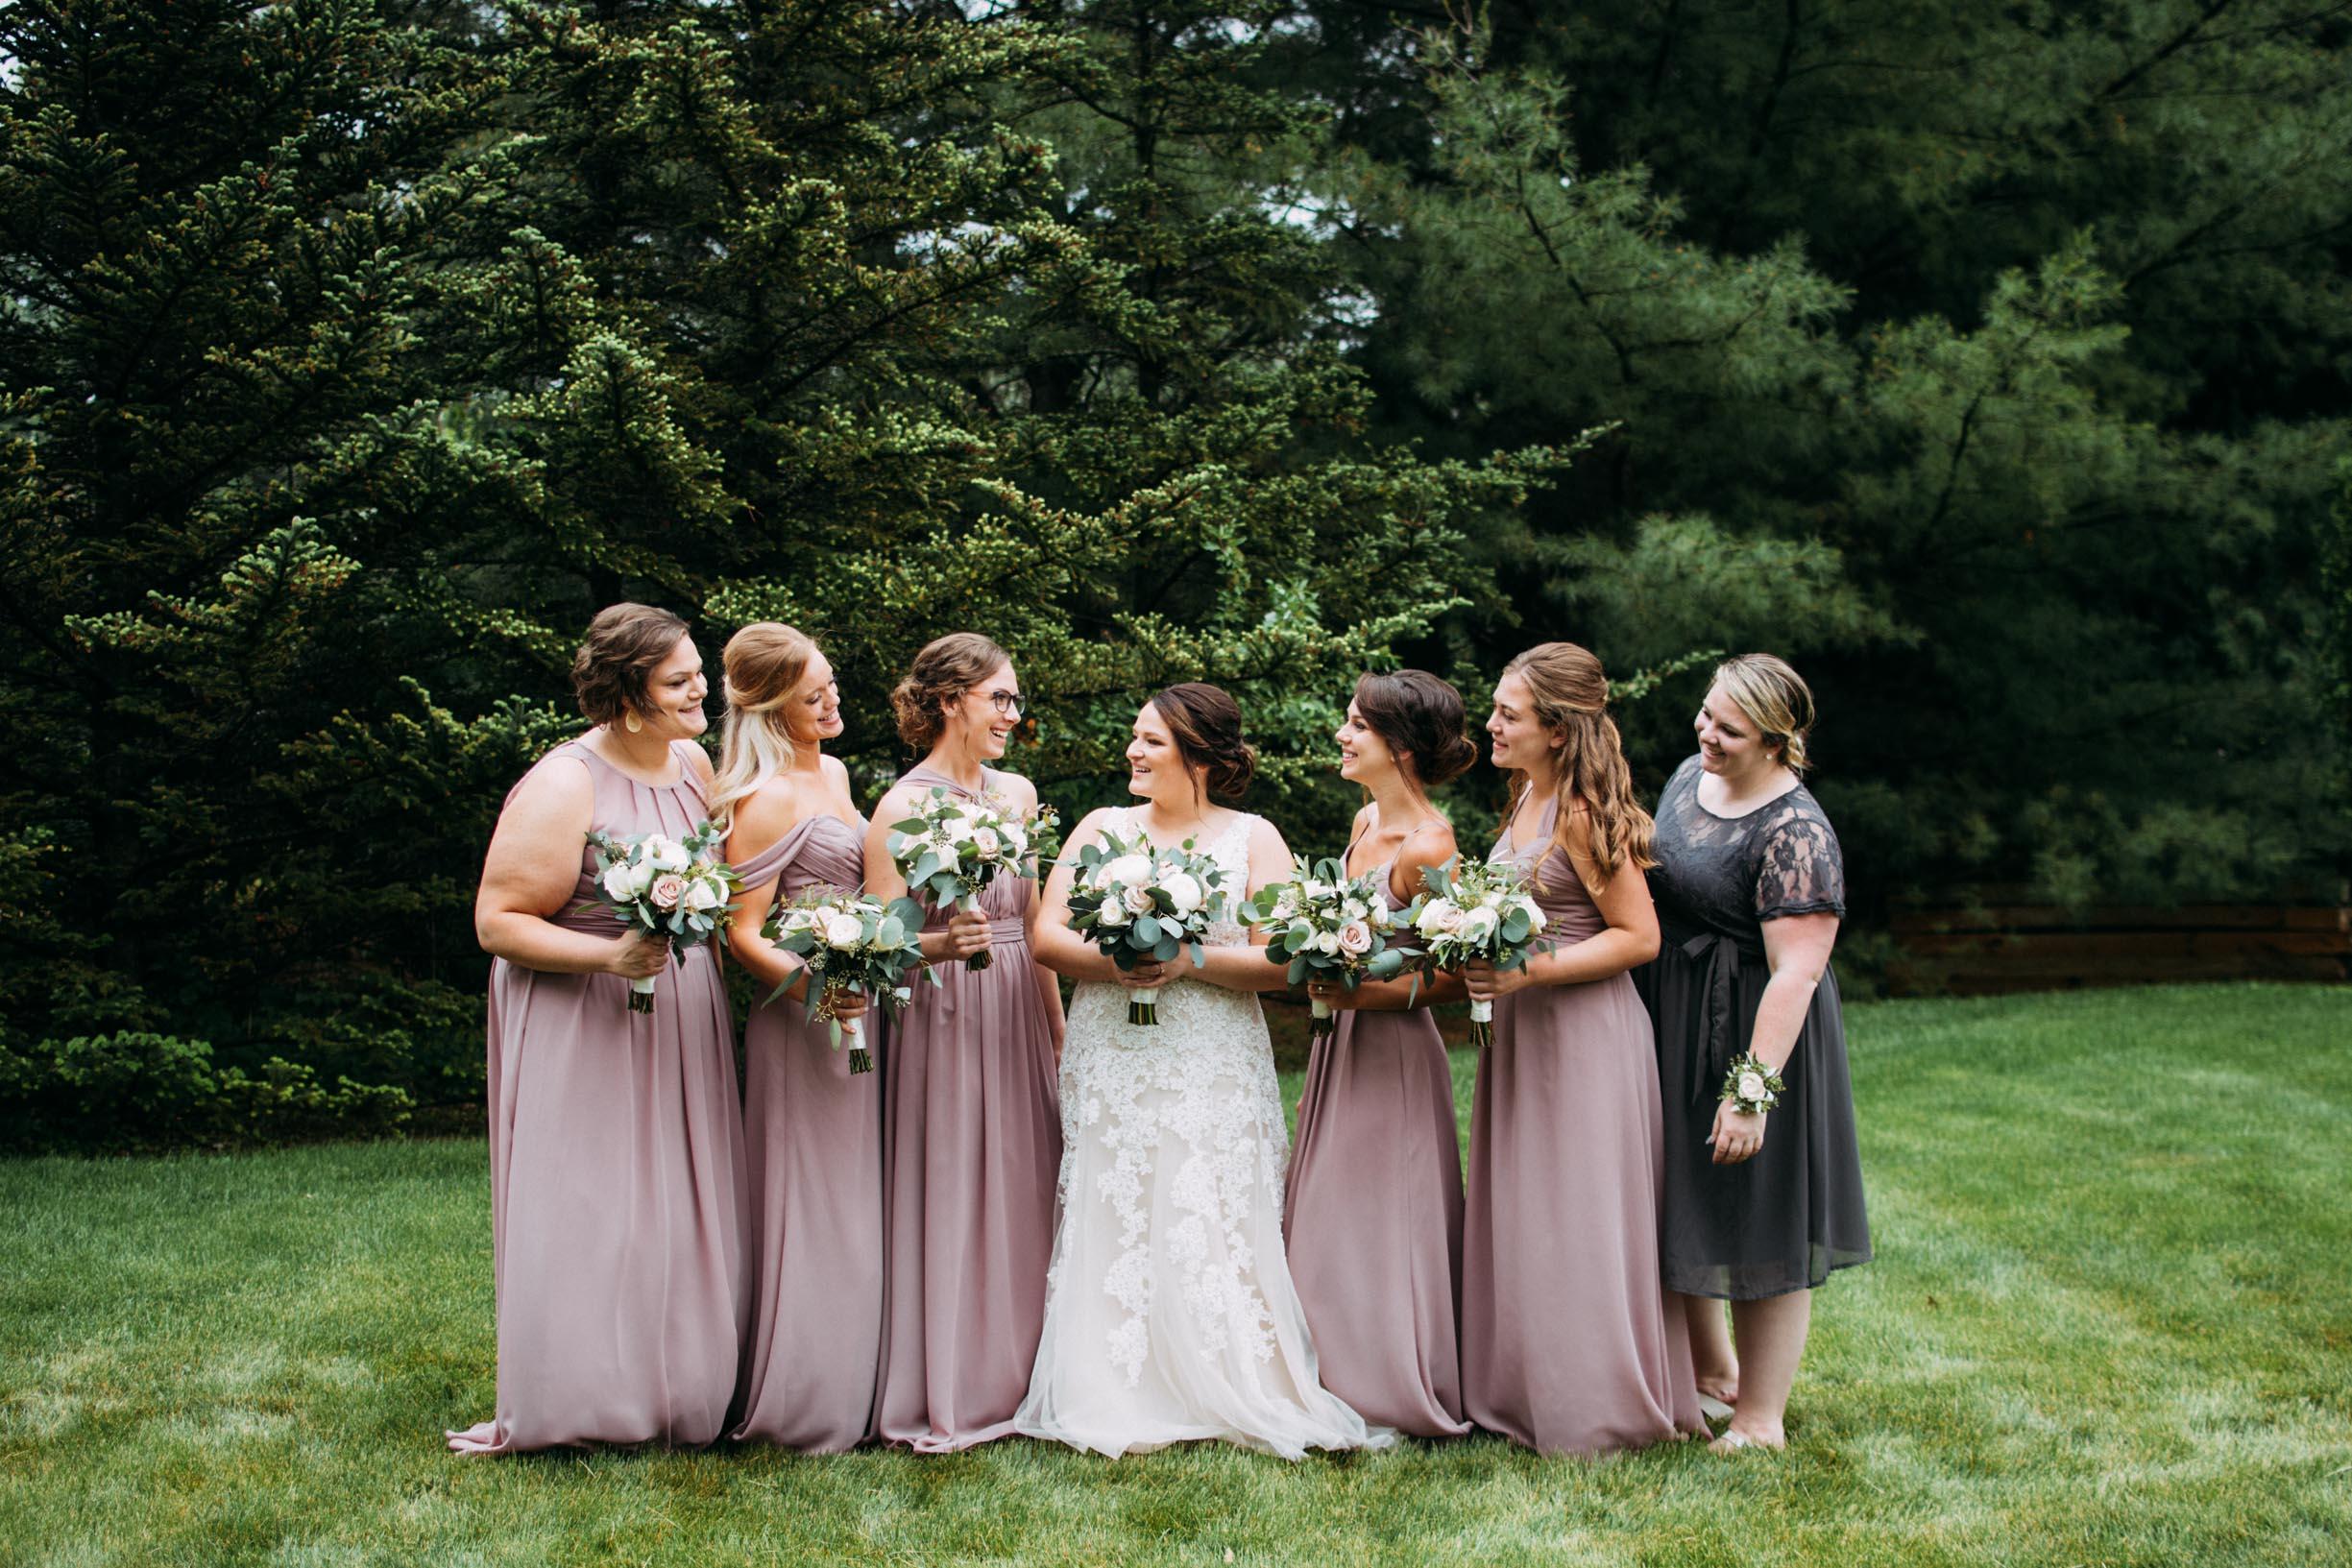 19-Jess_Jeremy_Minnesota_Wedding.jpg